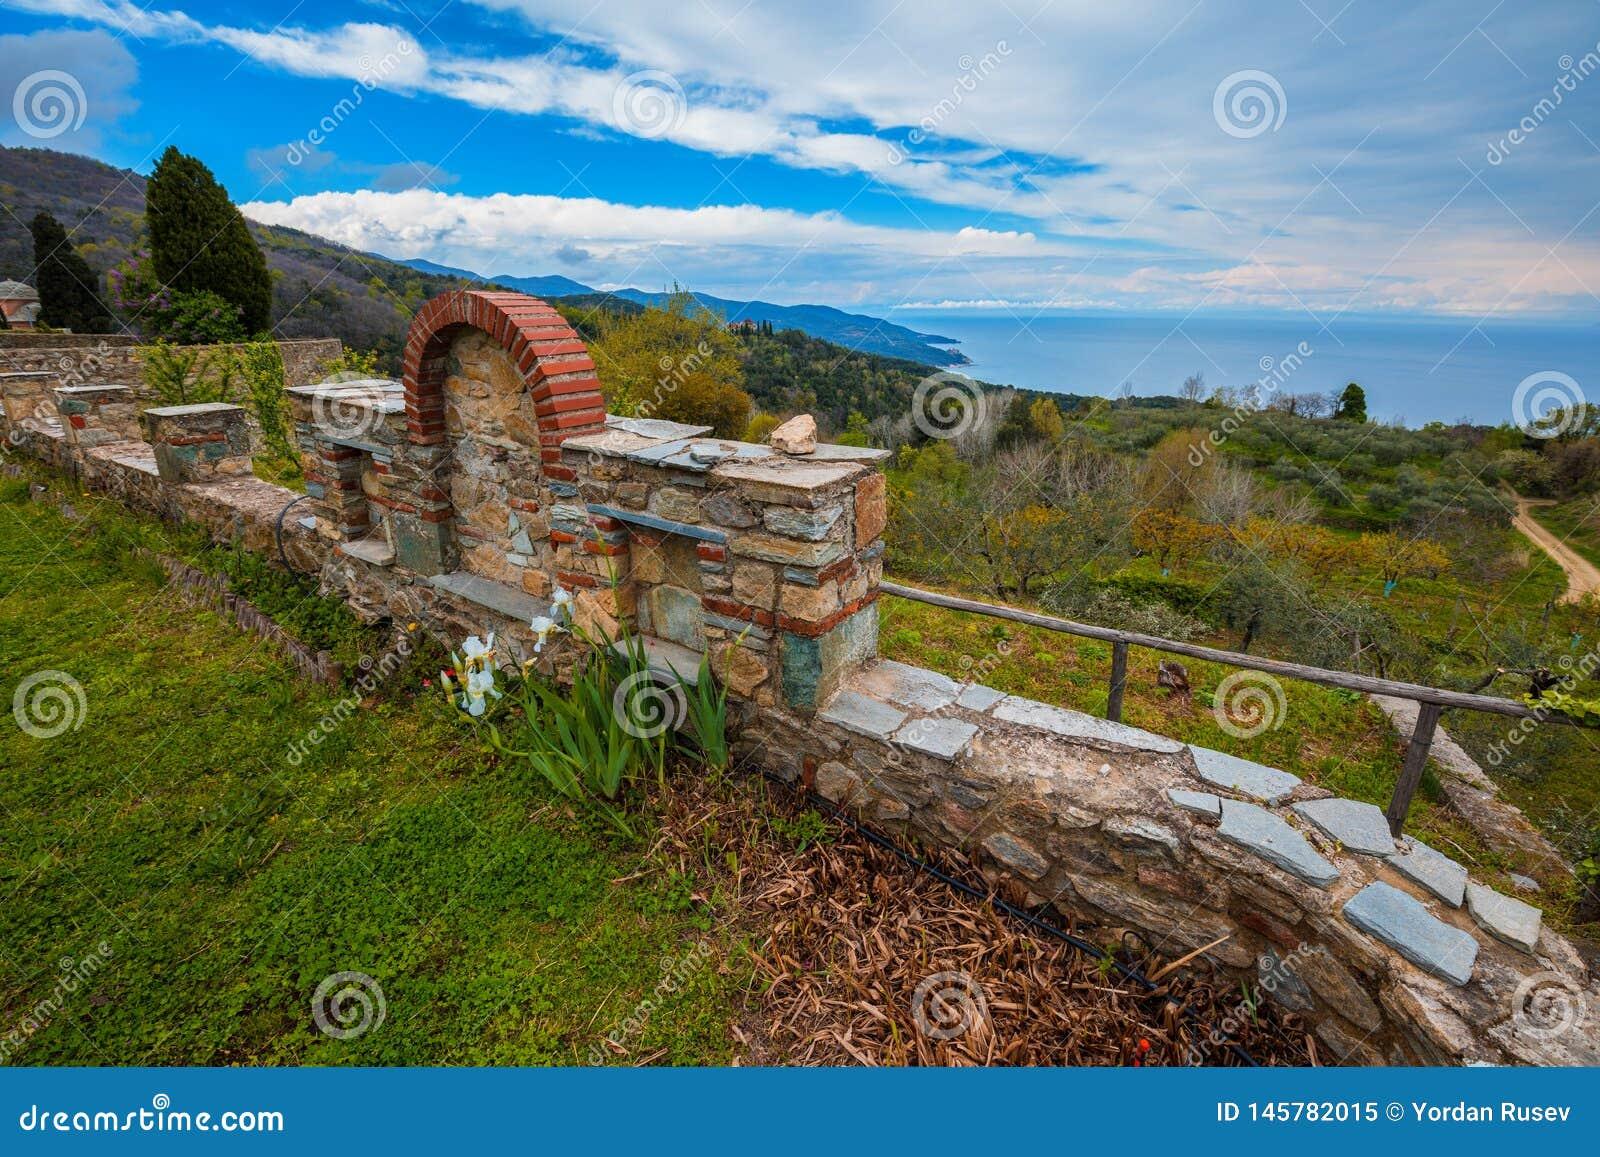 Monastero di Philotheou sul monte Athos